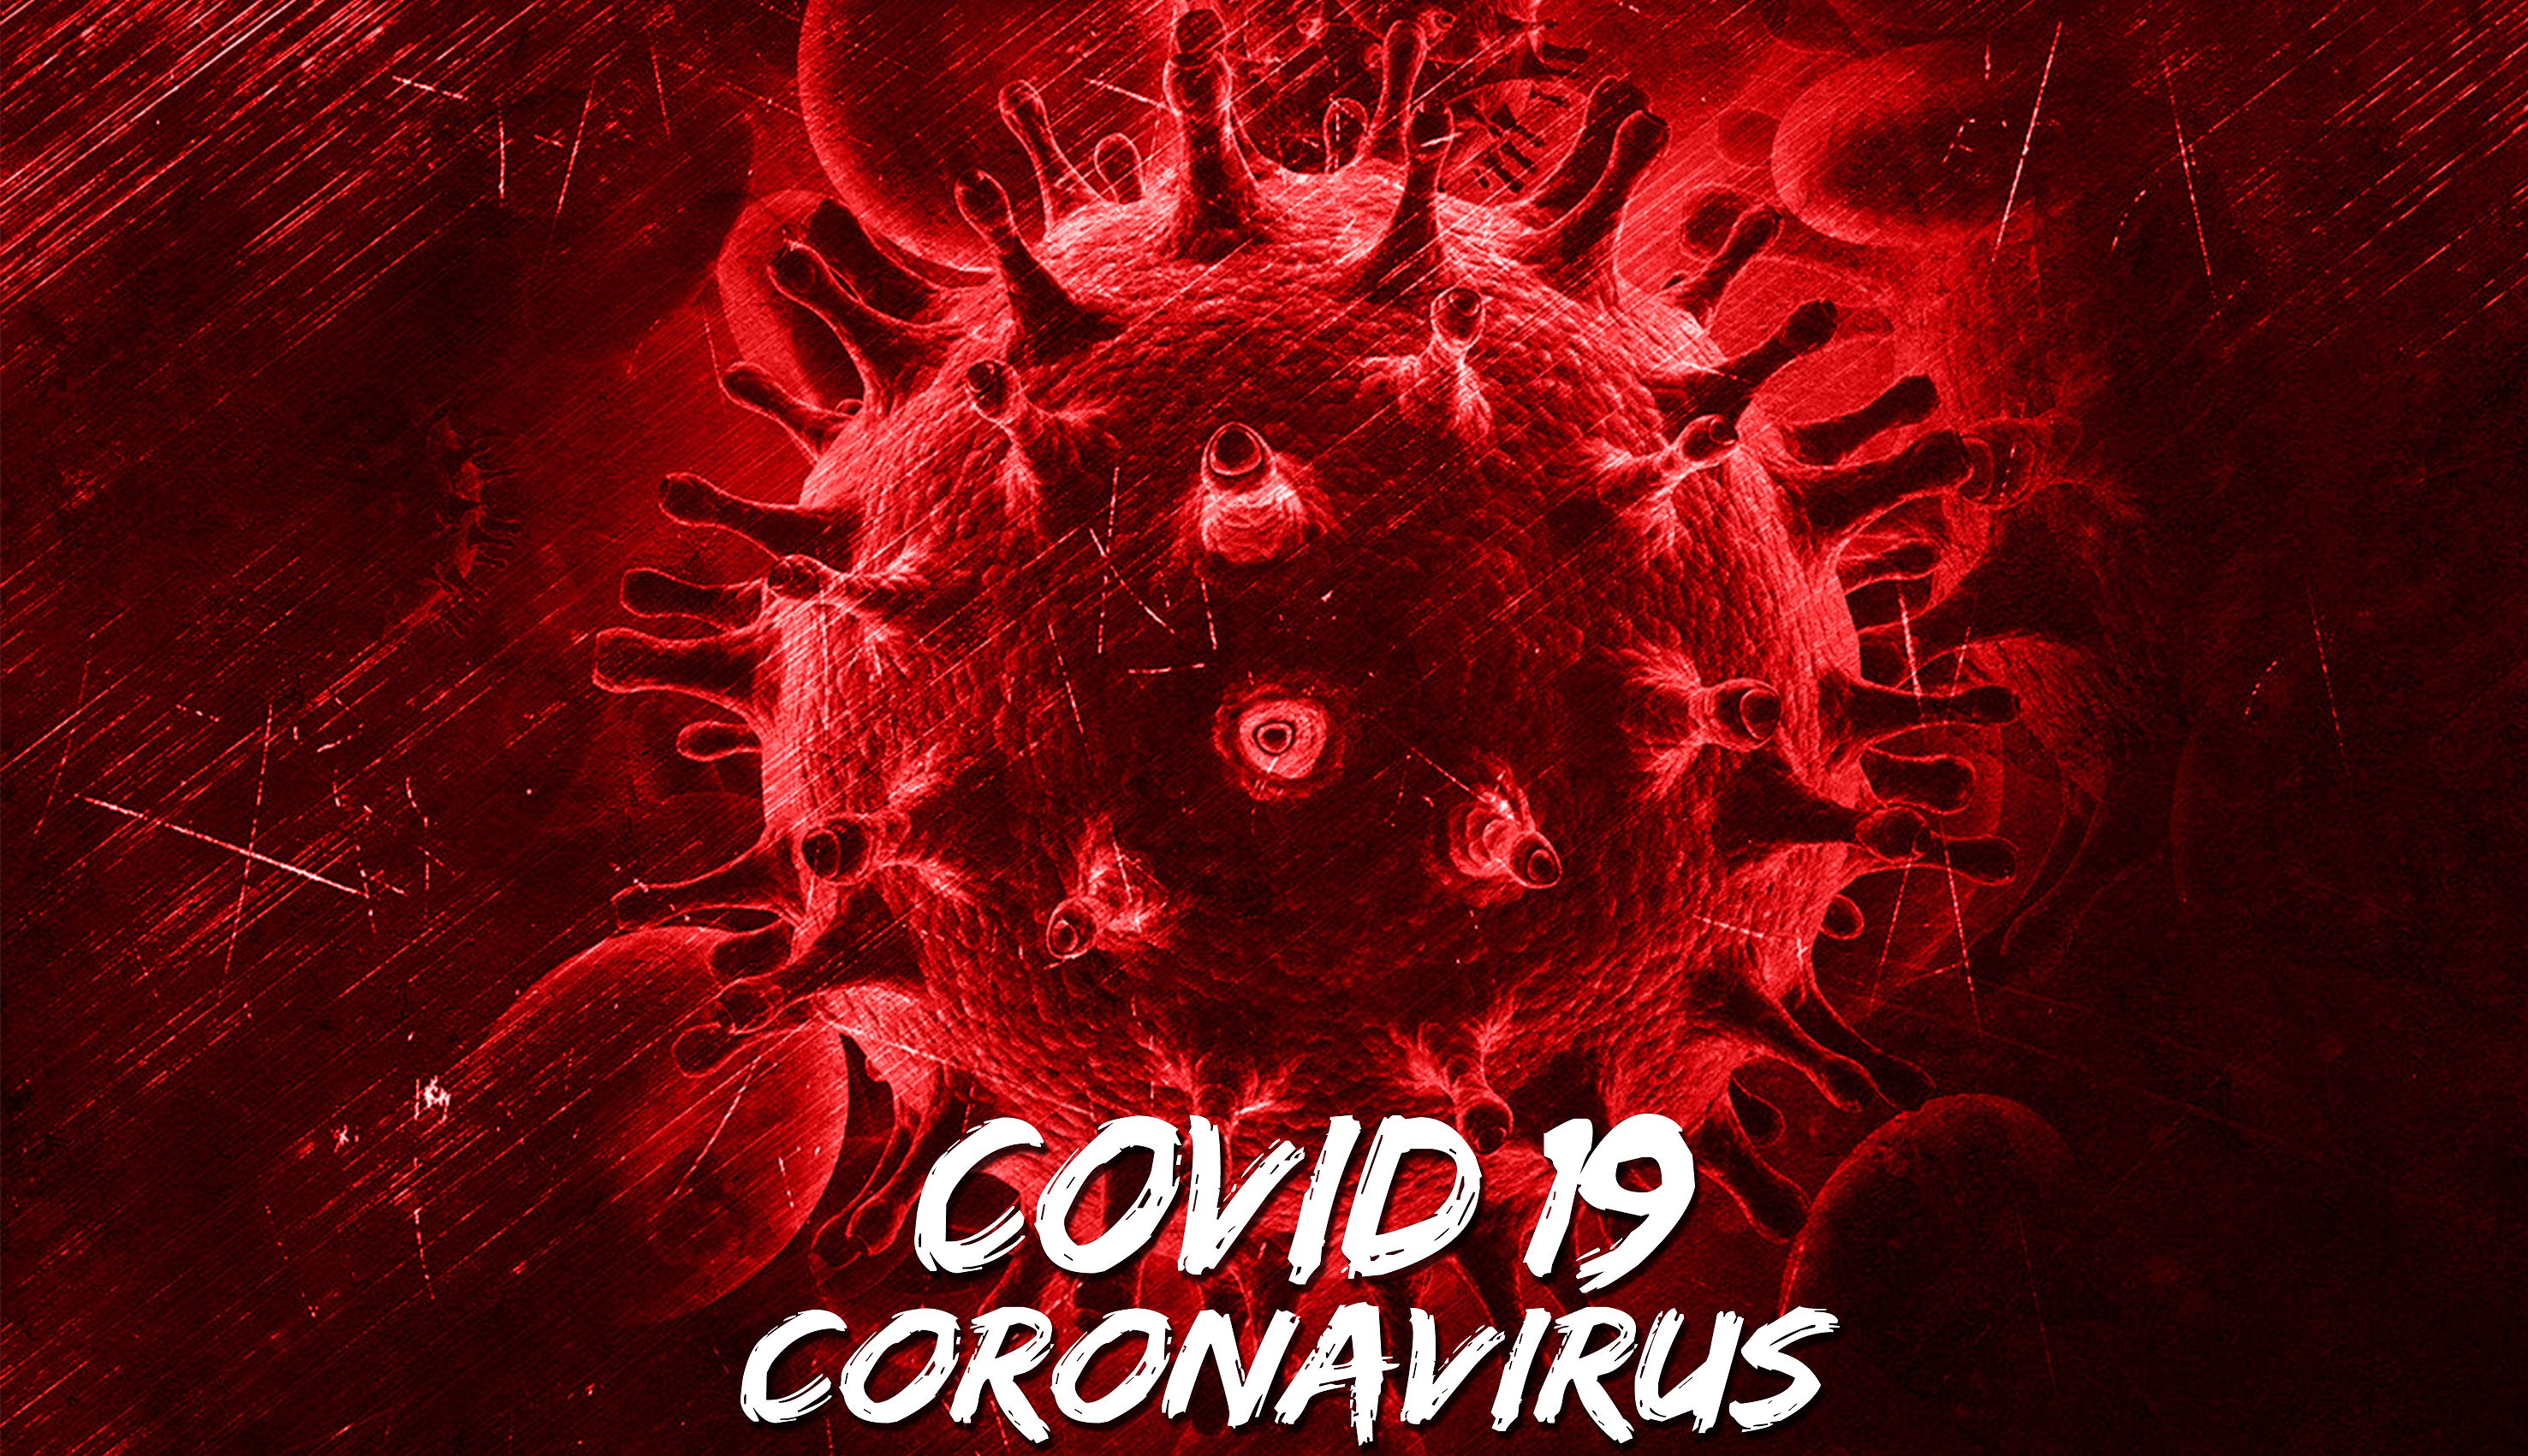 Coronavirus Preparedness - Prevention is Paramount